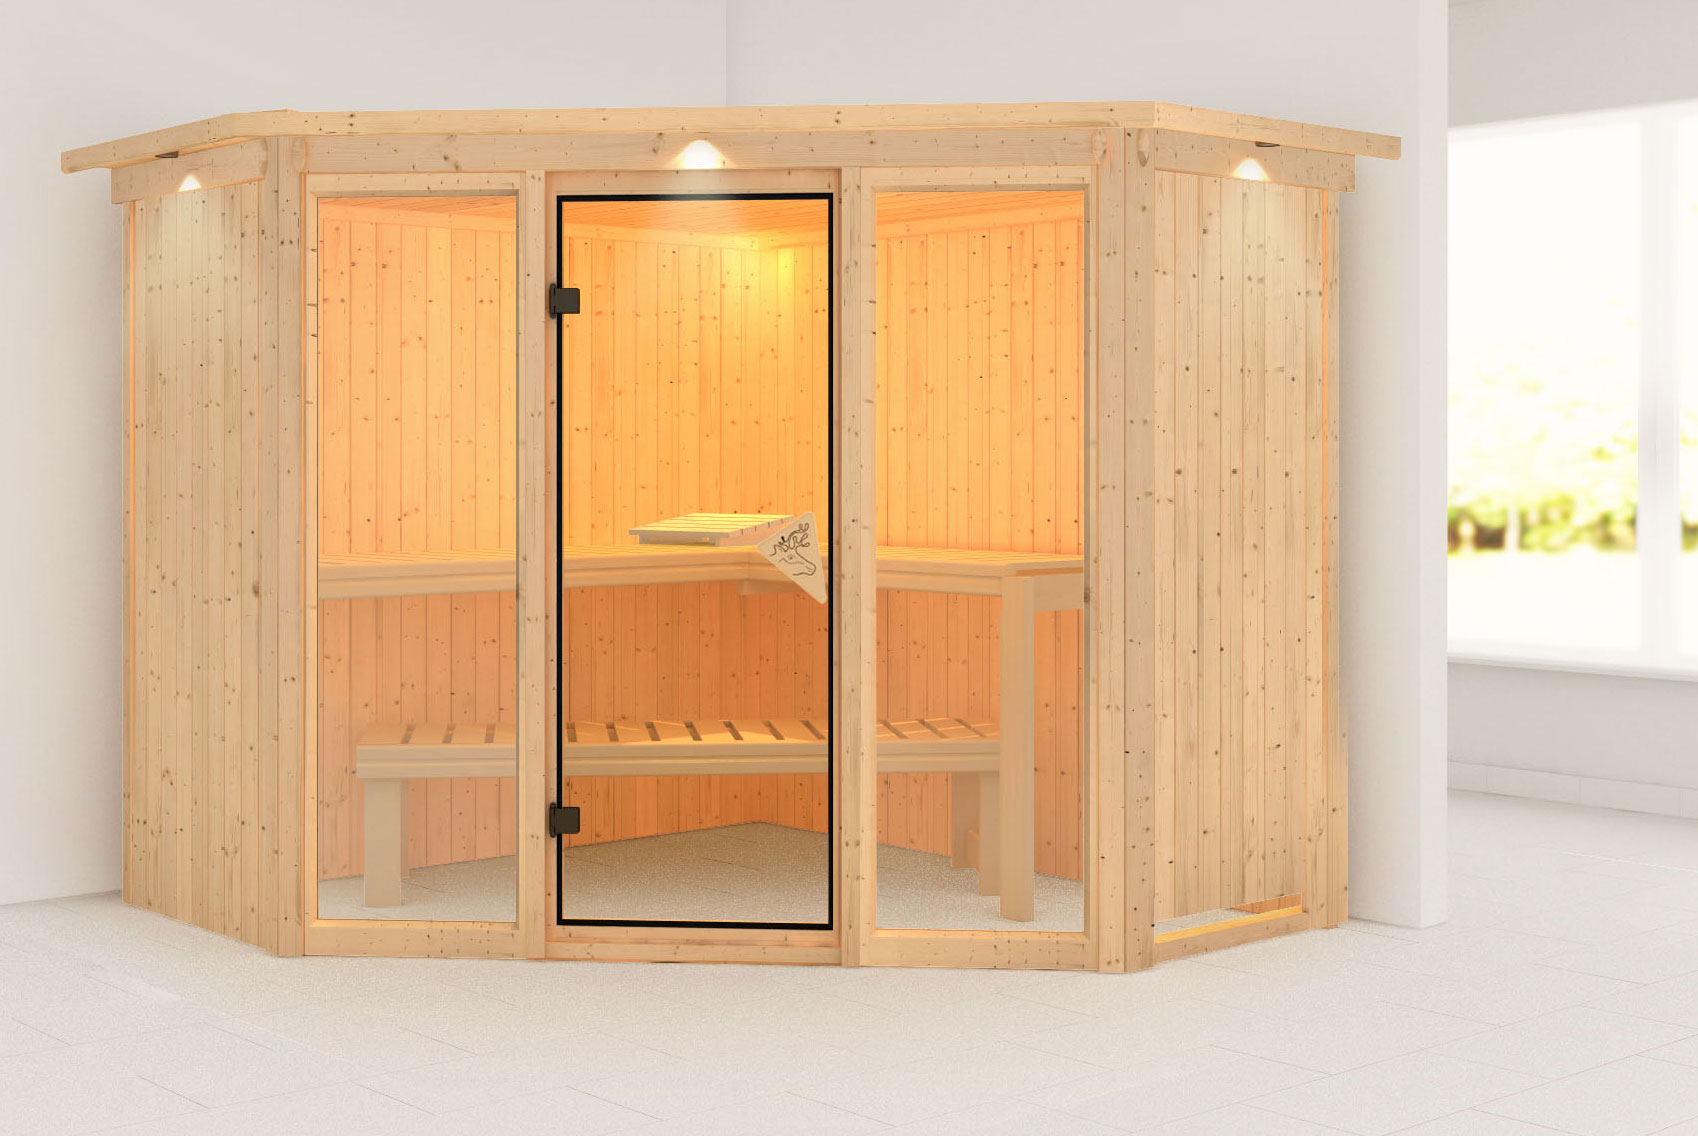 Karibu Sauna Flora 2 68mm Dachkranz ohne Ofen classic Tür Bild 1